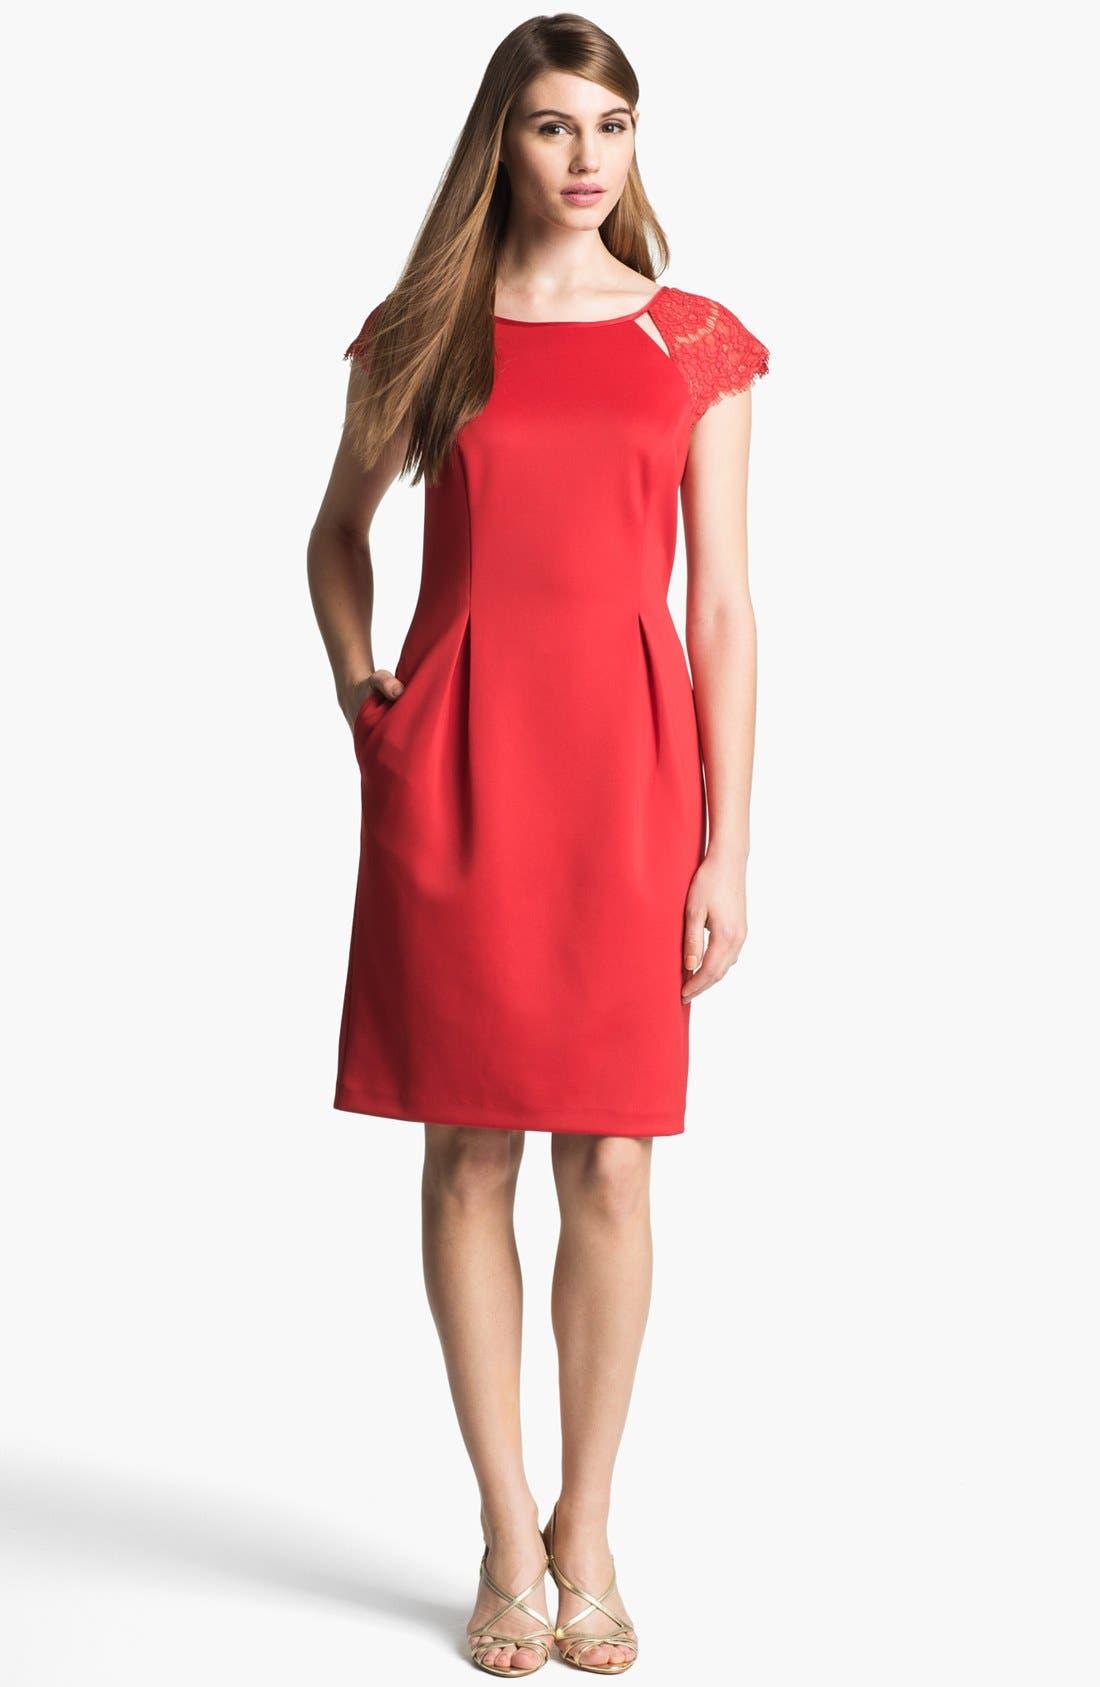 Alternate Image 1 Selected - Alex Evenings Illusion Sleeve Sheath Dress